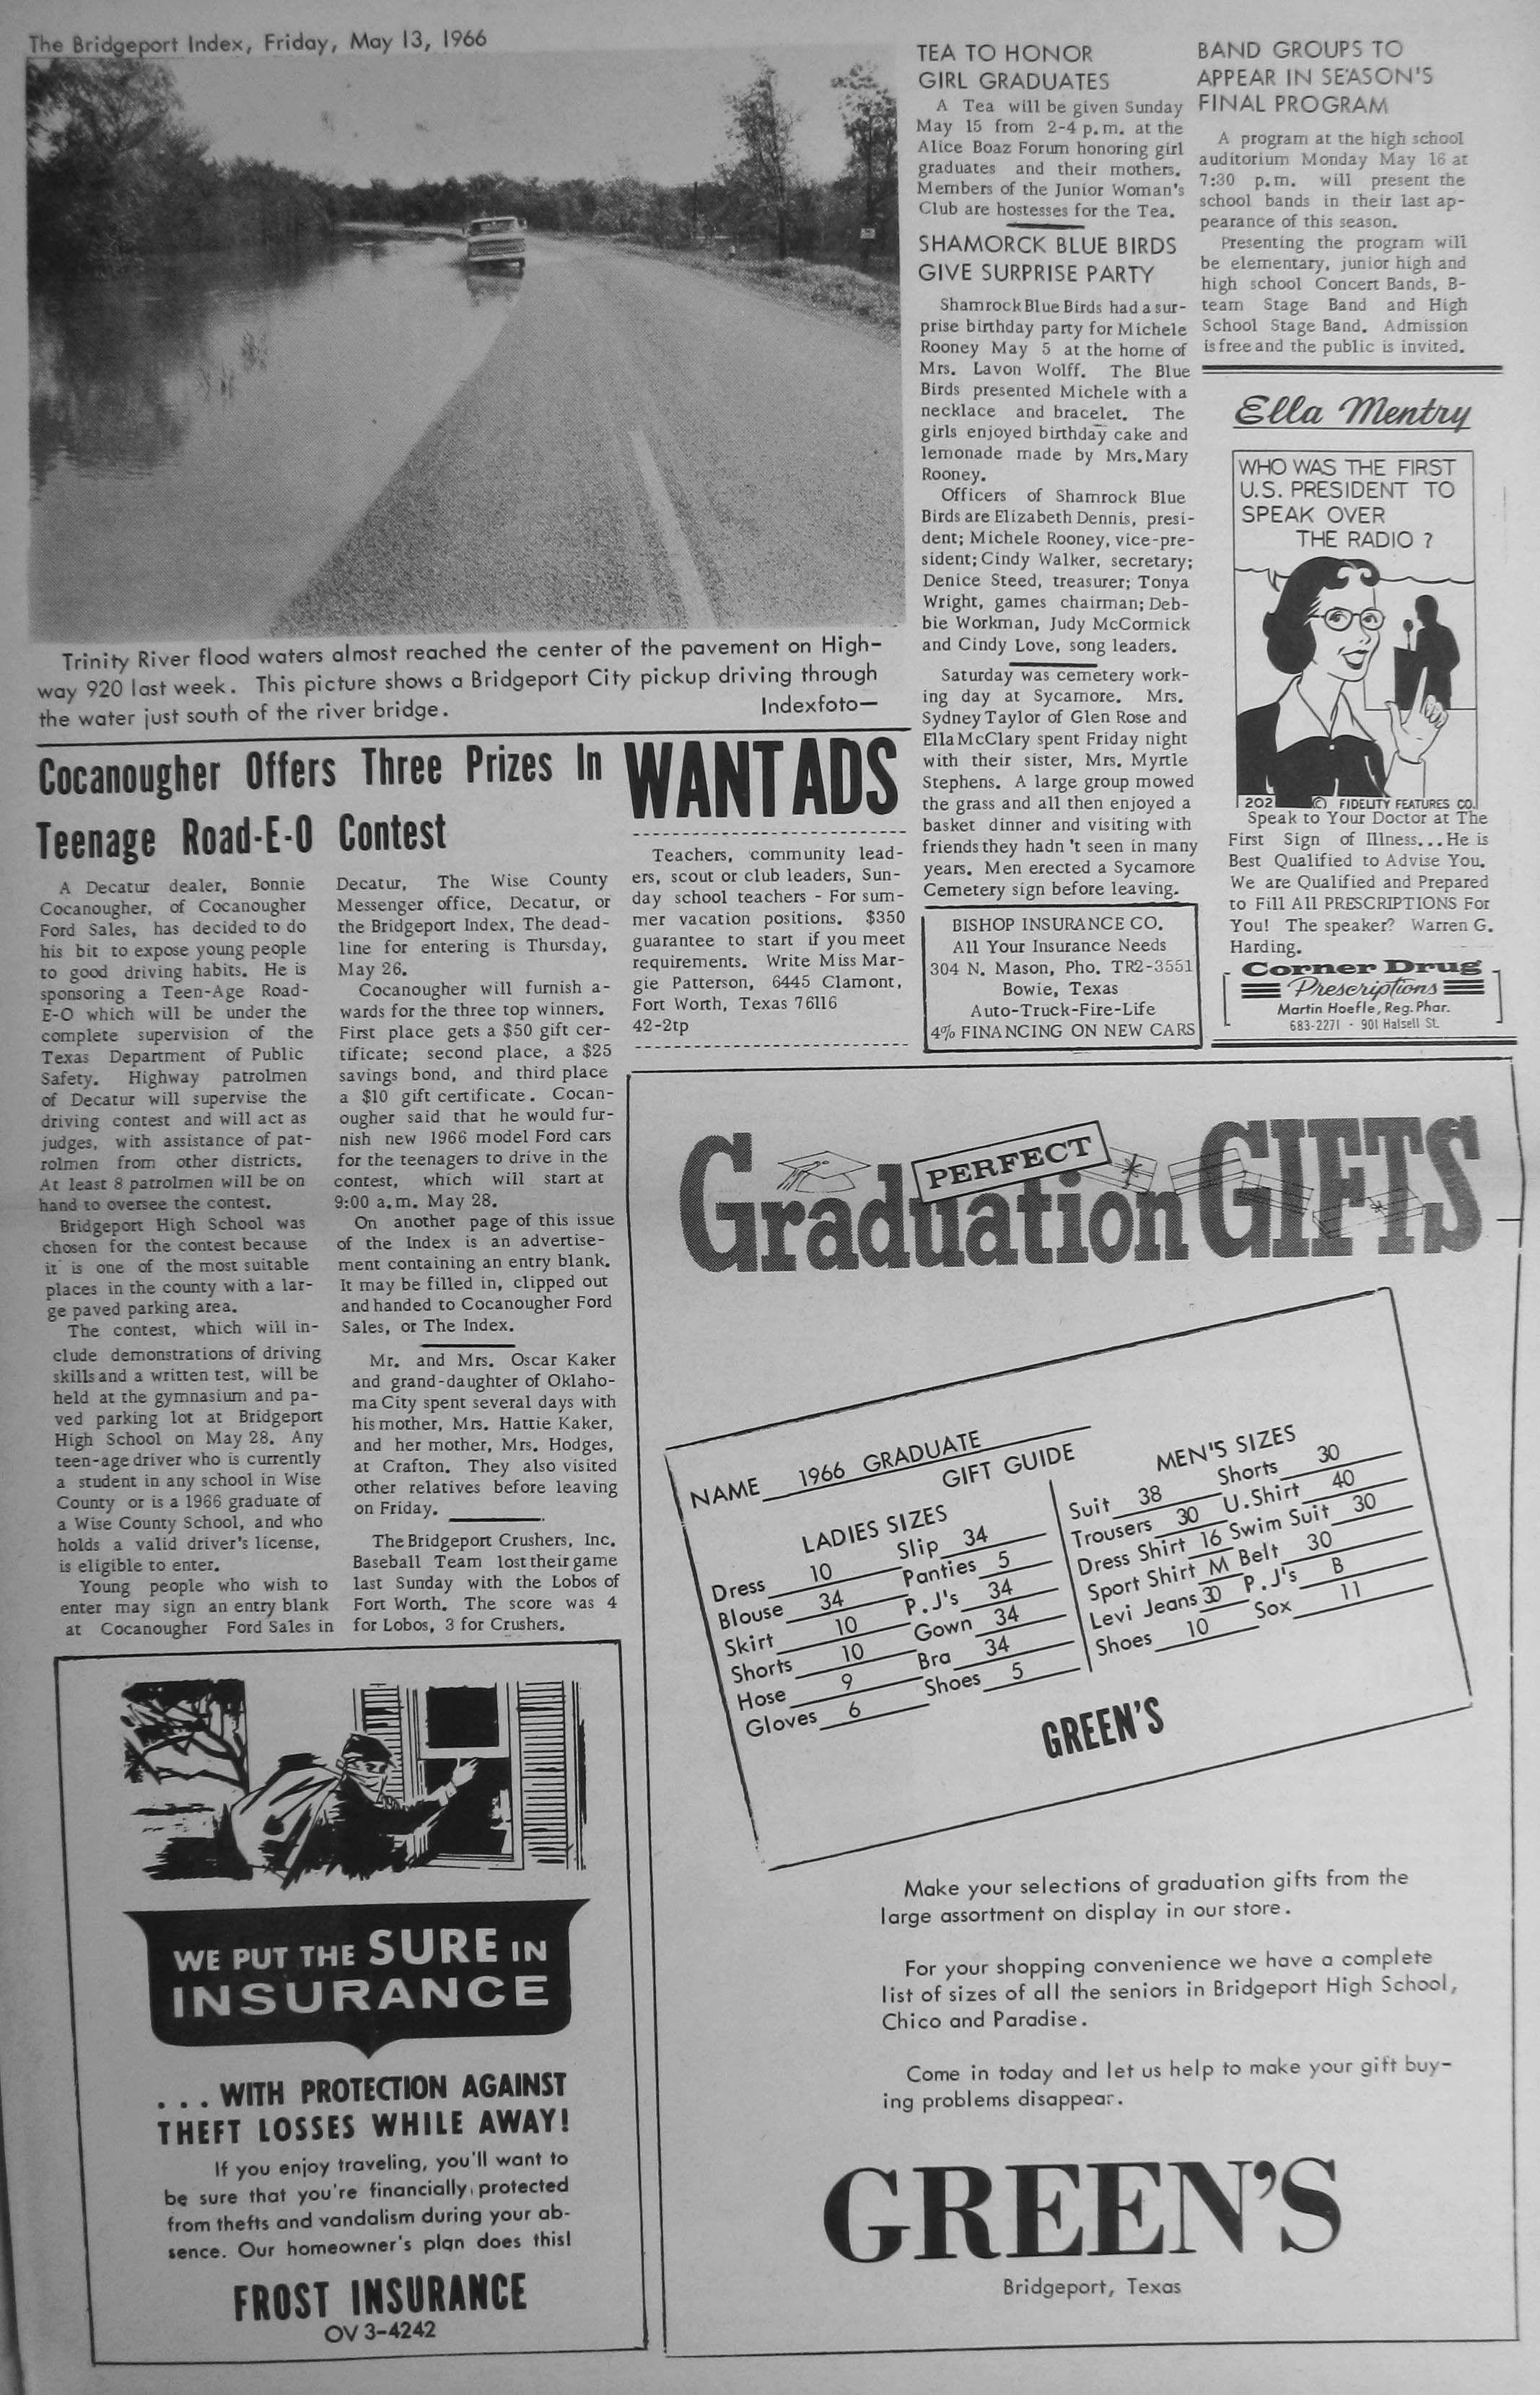 http://www.wisecountytexas.info/bridgeportindex/images/1966/1966-05-13-pg03.jpg